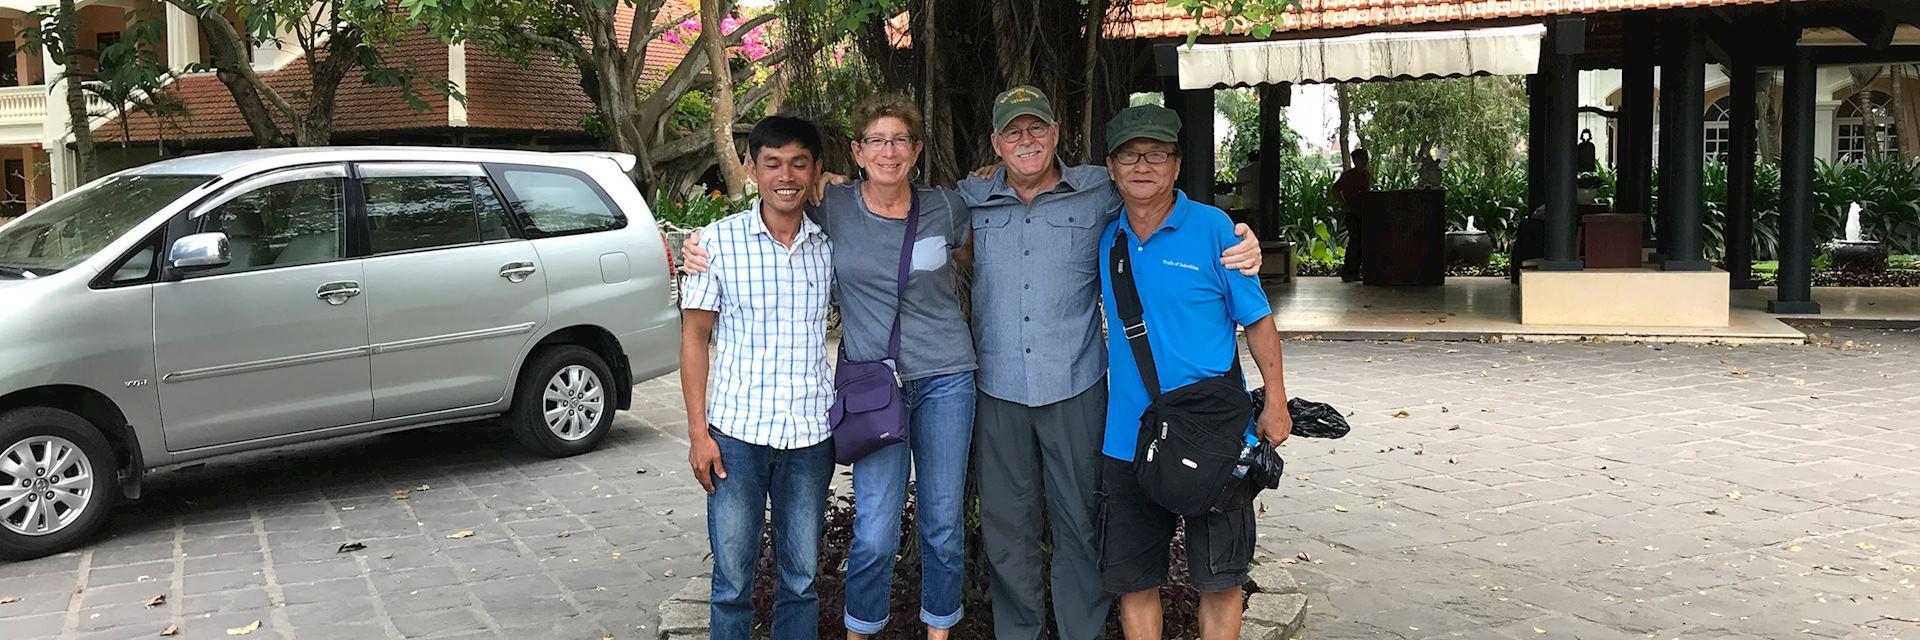 Reunited in Vietnam